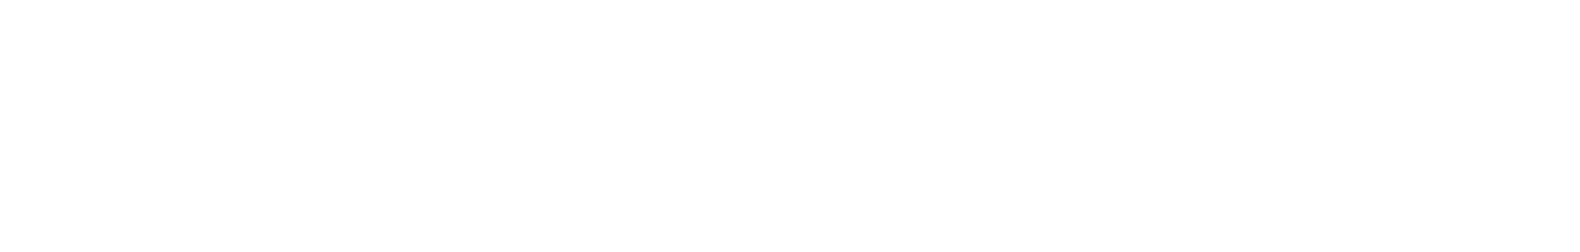 Neolabs